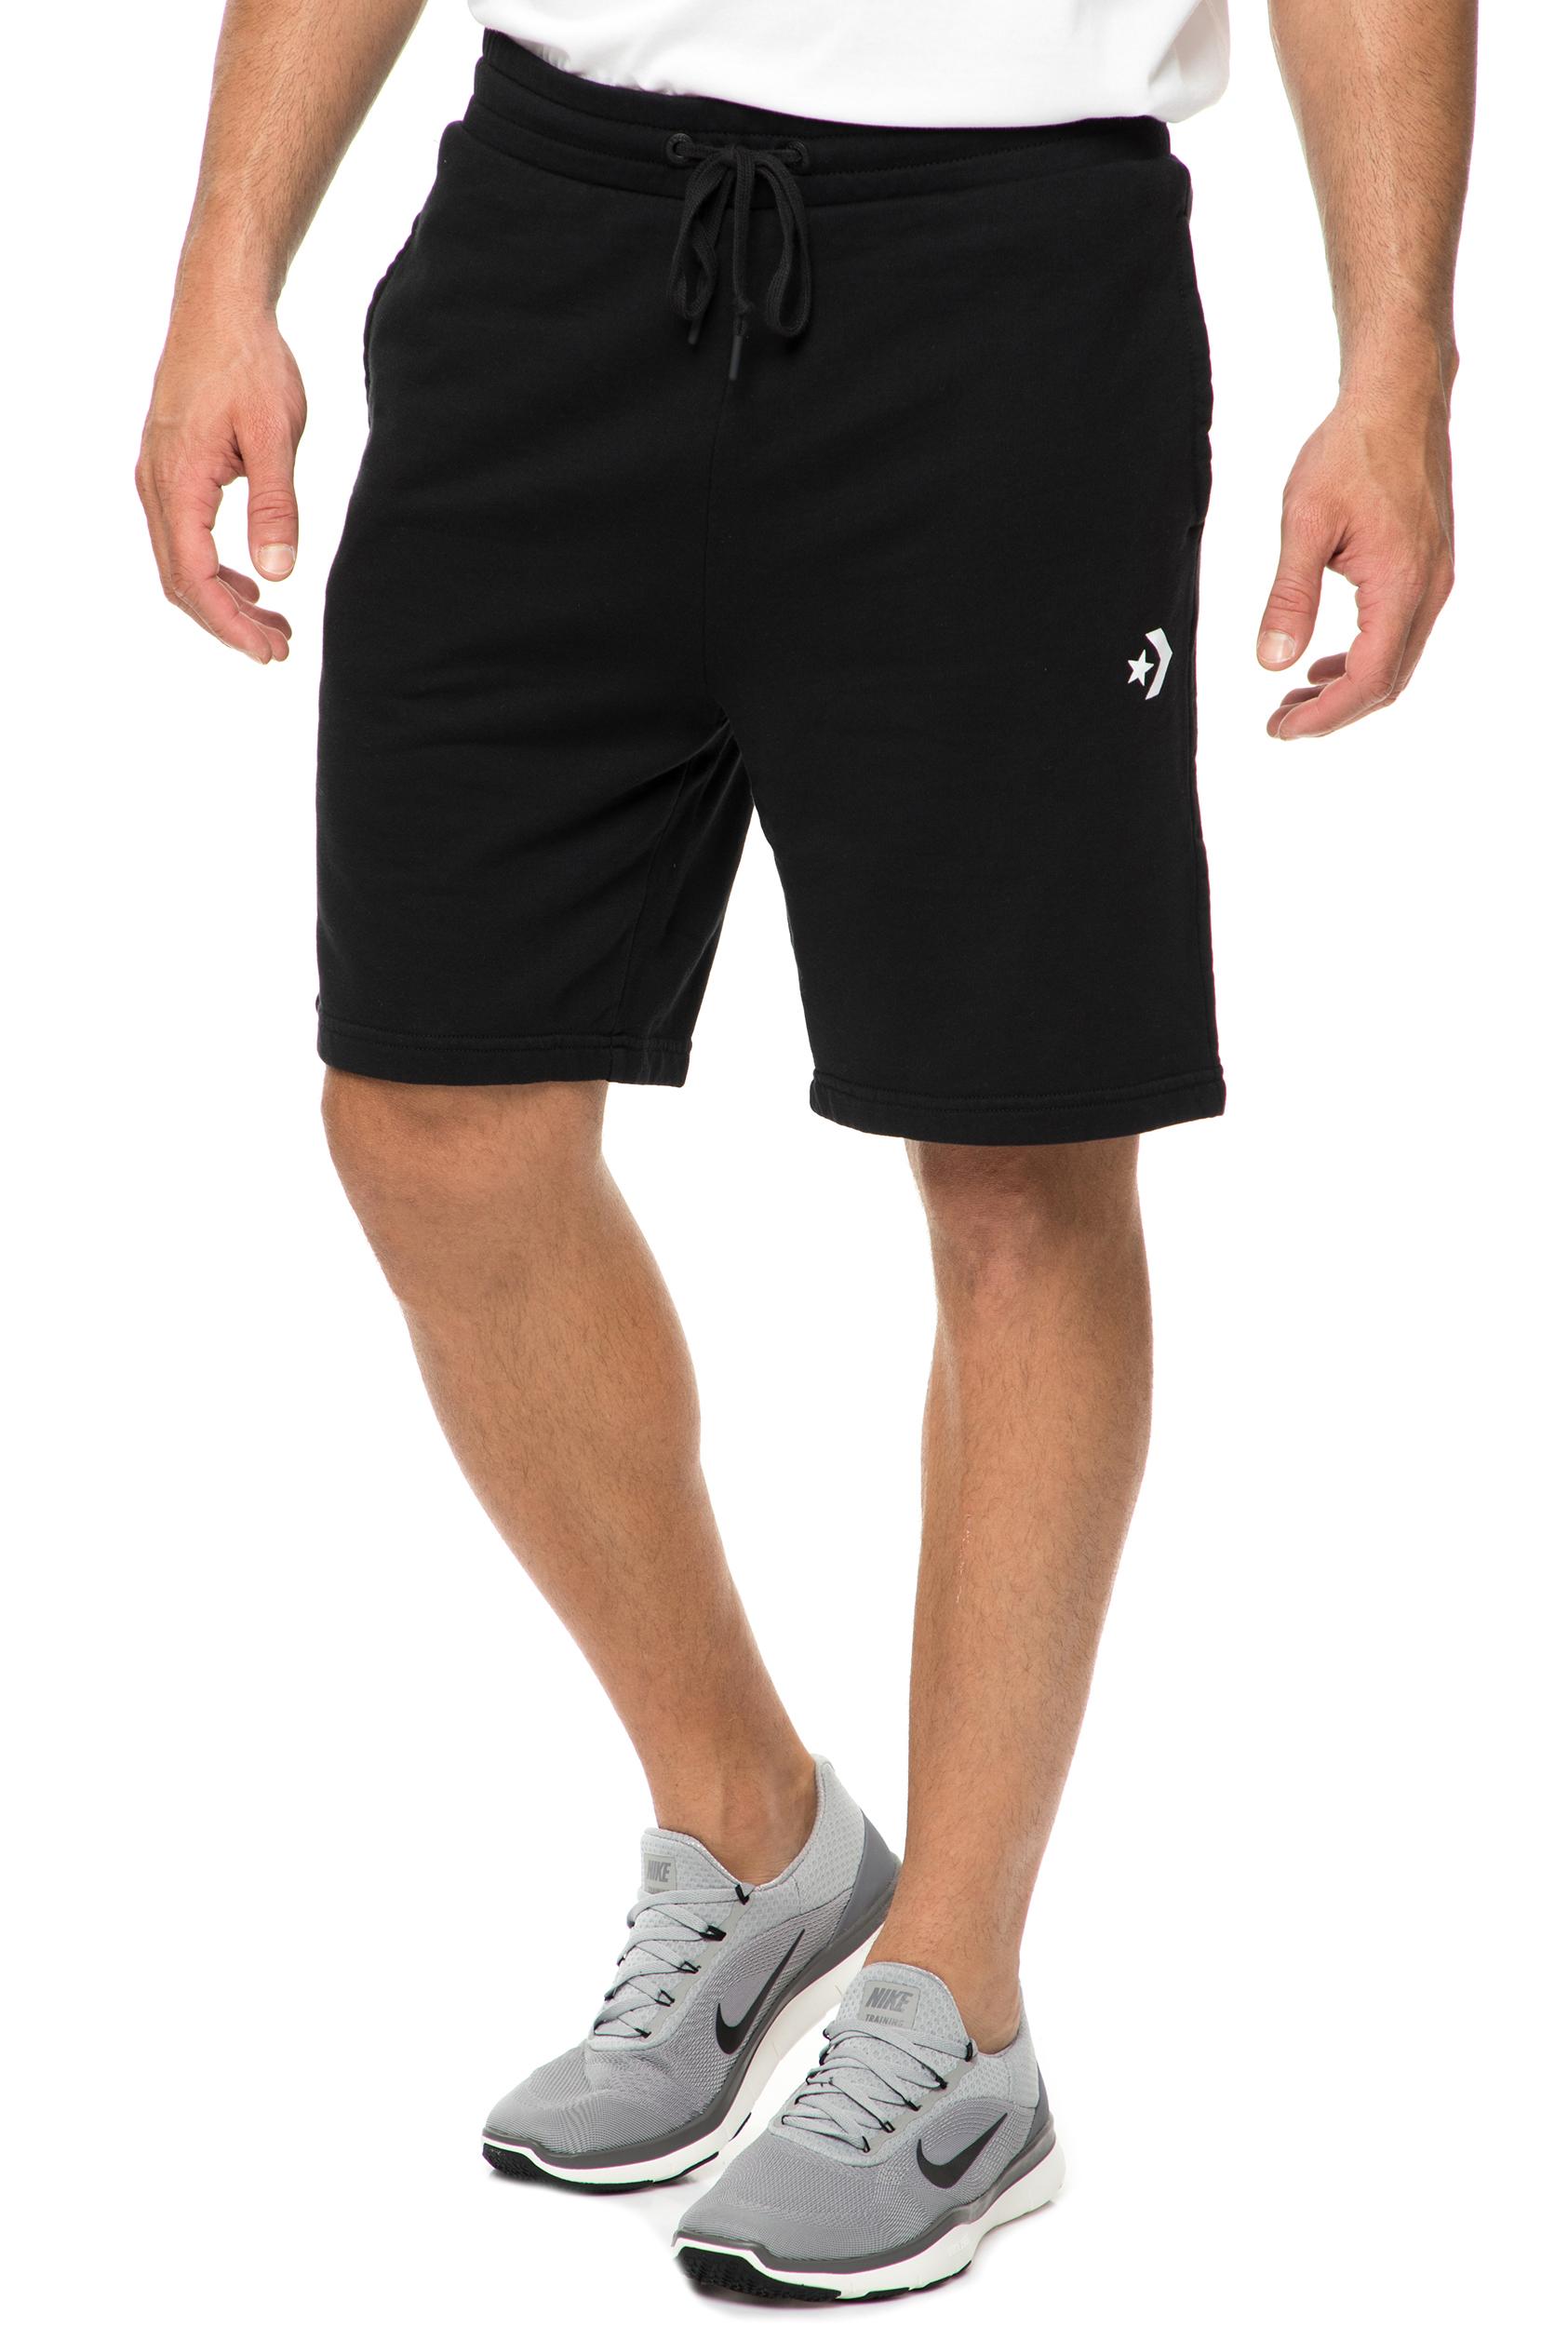 CONVERSE - Ανδρική βερμούδα CONVERSE STAR CHEVRON FT μαύρη ανδρικά ρούχα σορτς βερμούδες casual jean